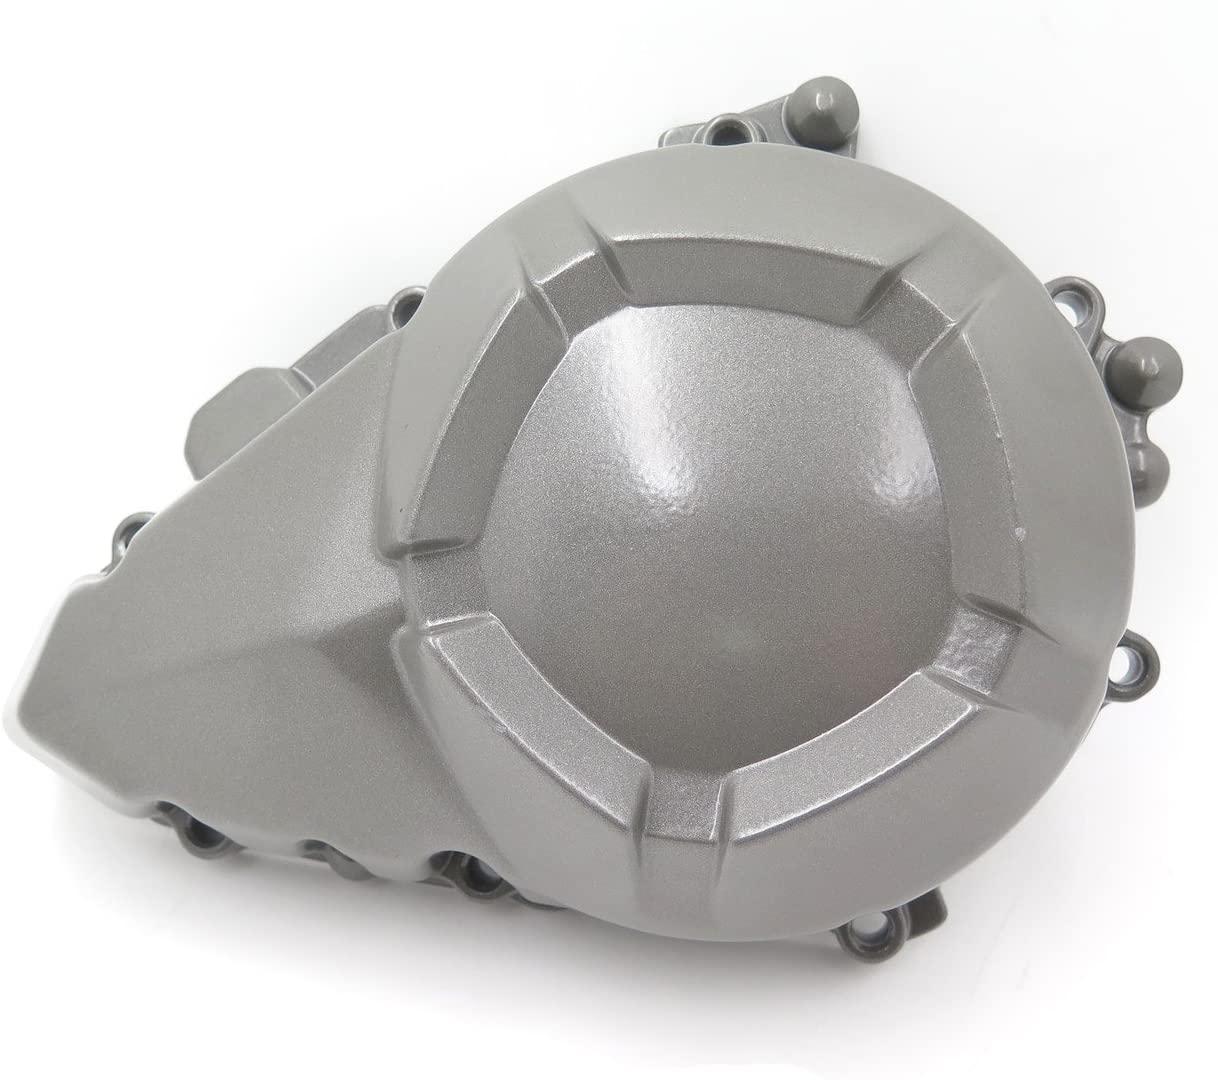 HONGK- Aluminum Stator Engine Cover Crankcase Crank Case Compatible with kawasaki Z800 2013 2014 [B01N958YJU]